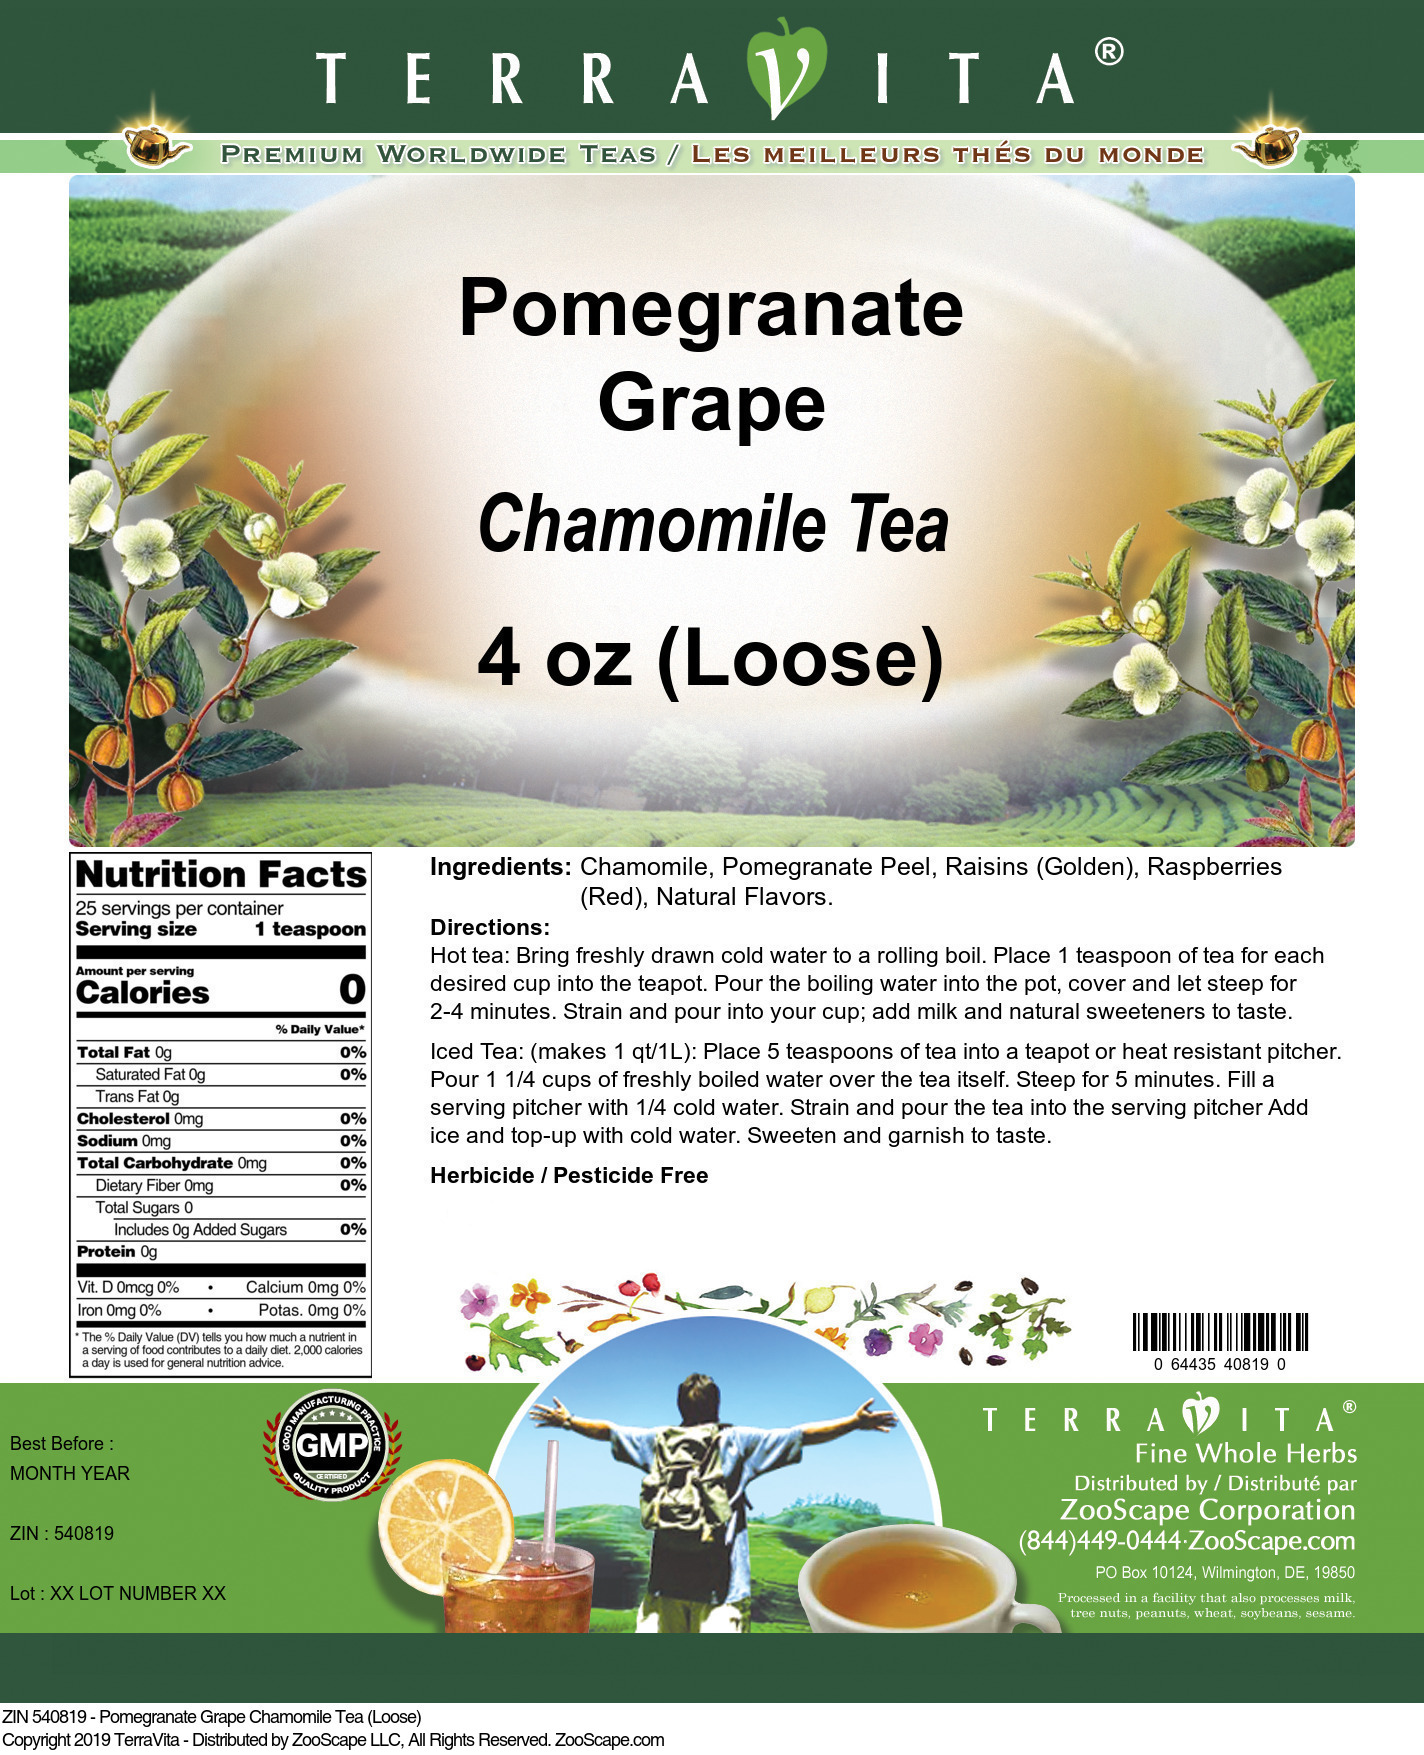 Pomegranate Grape Chamomile Tea